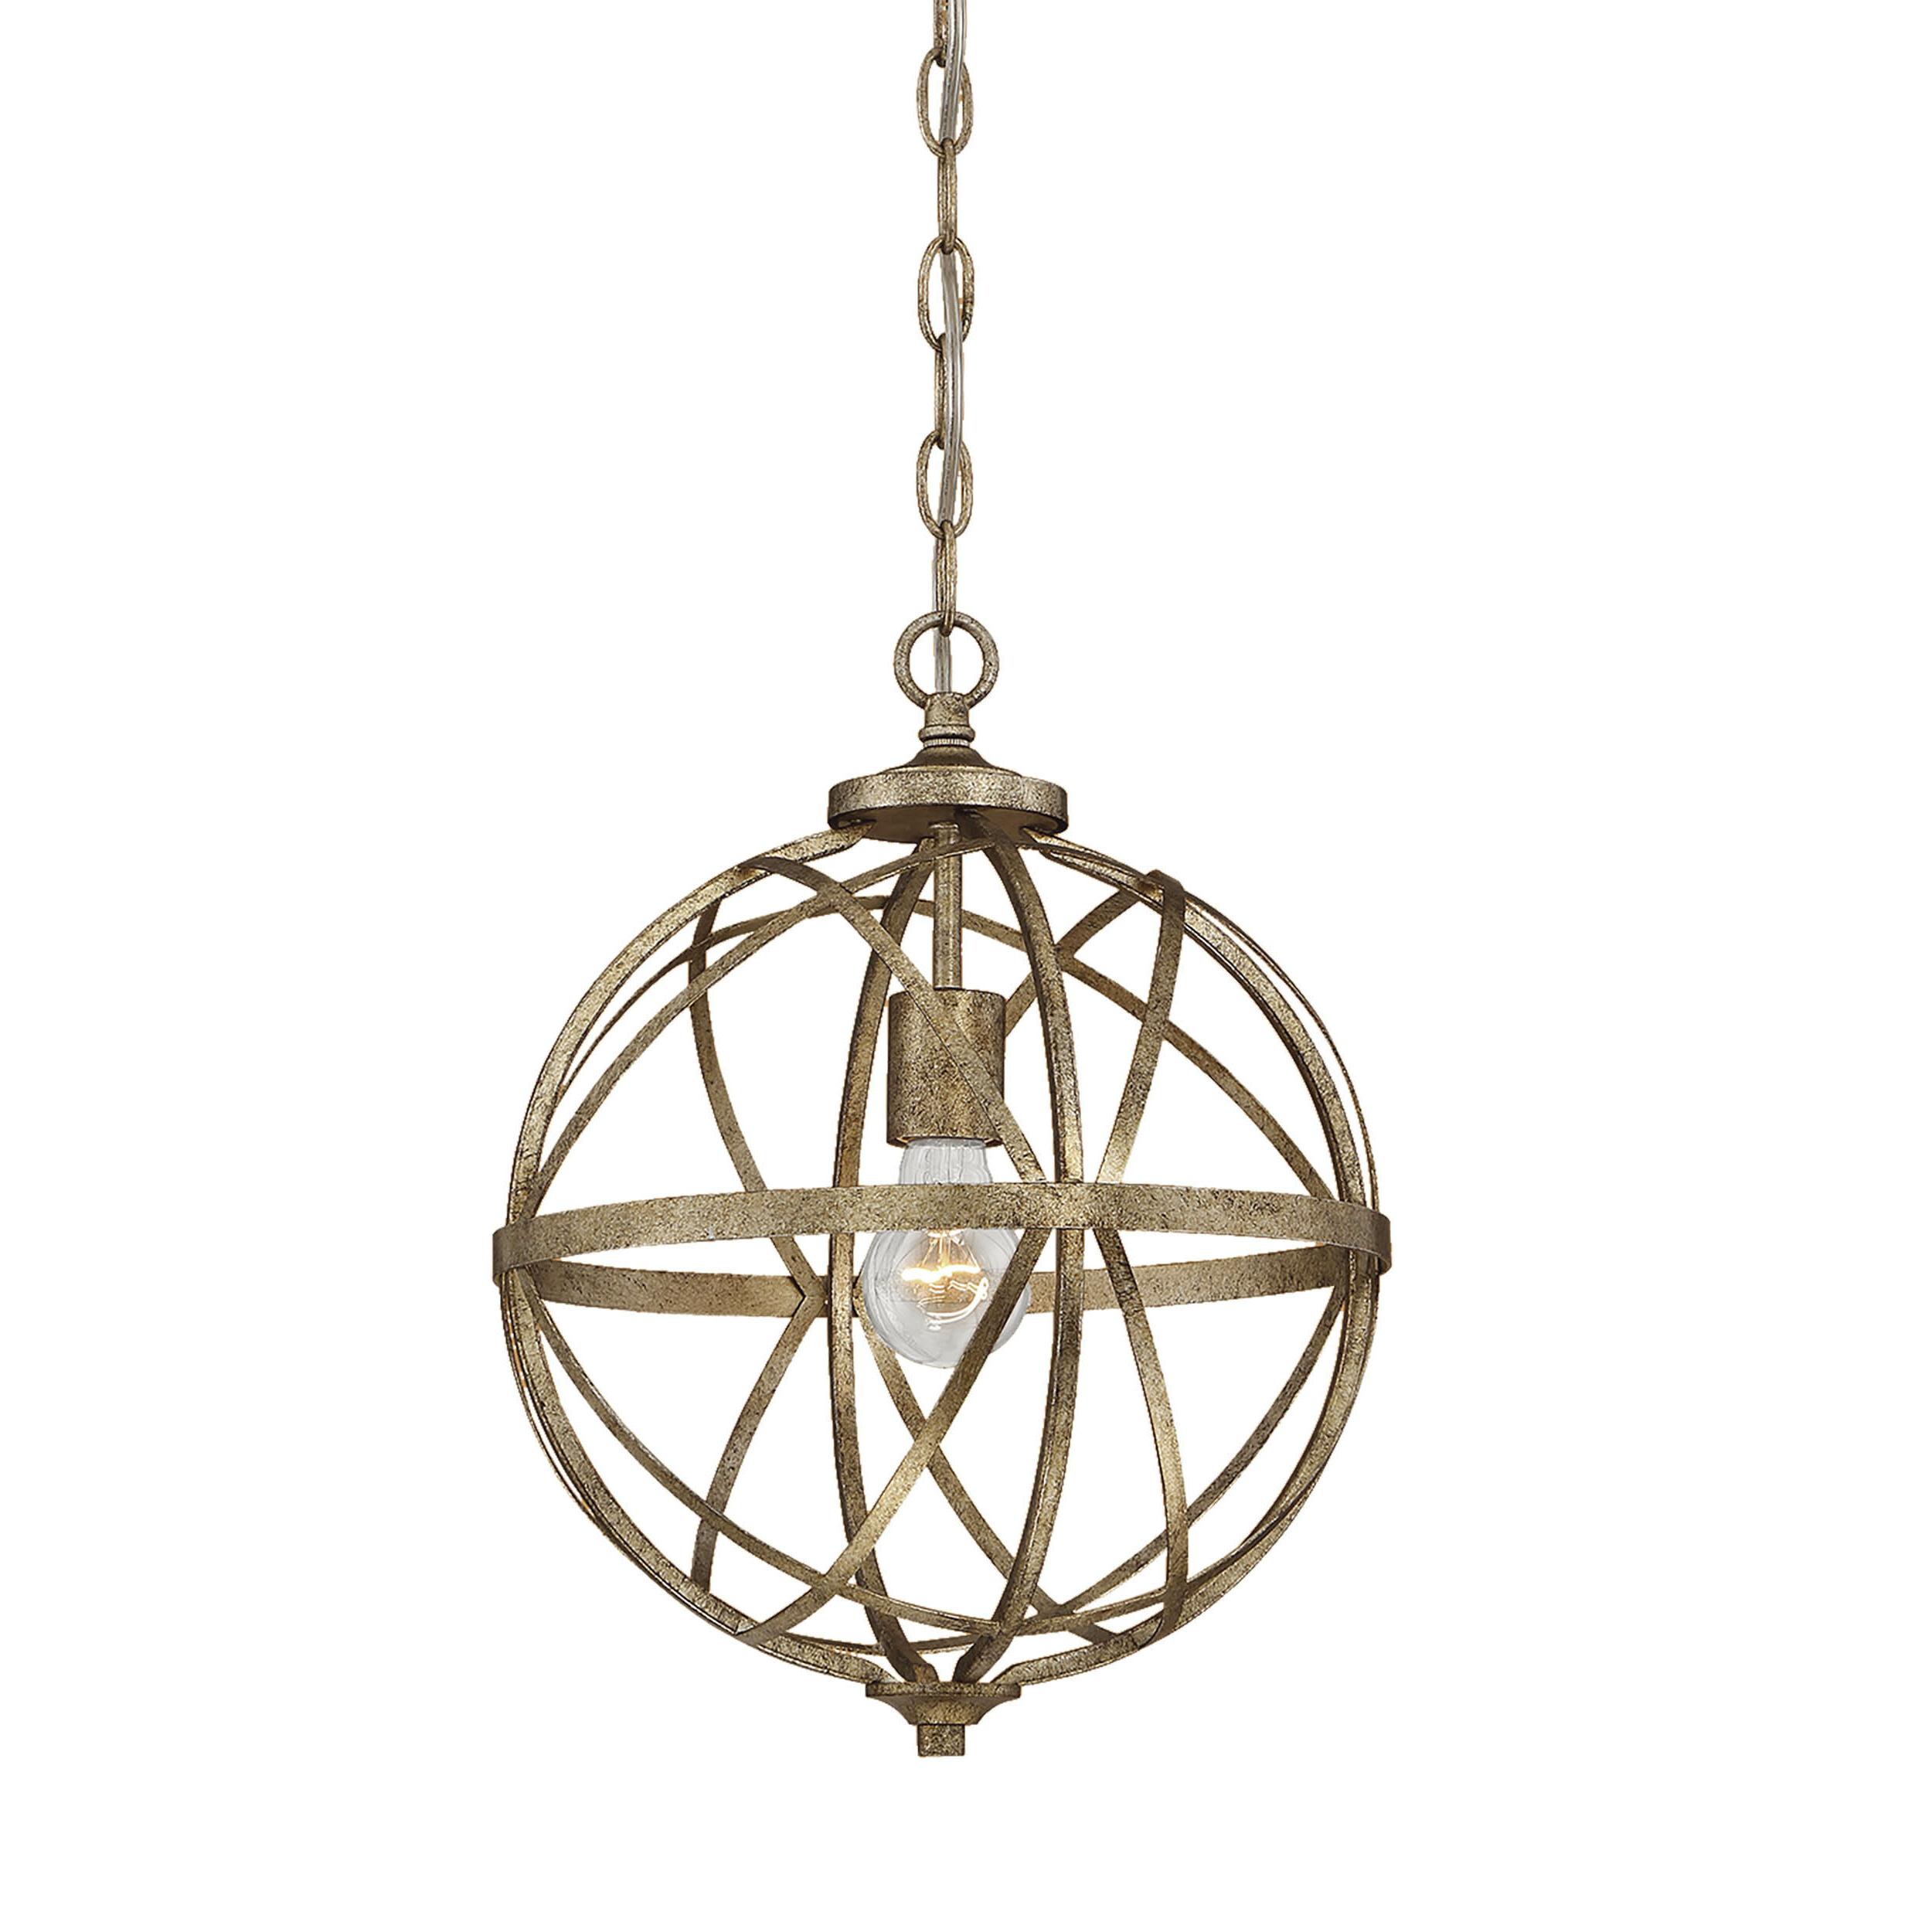 Rodden 1-Light Single Globe Pendant with Preferred Irwin 1-Light Single Globe Pendants